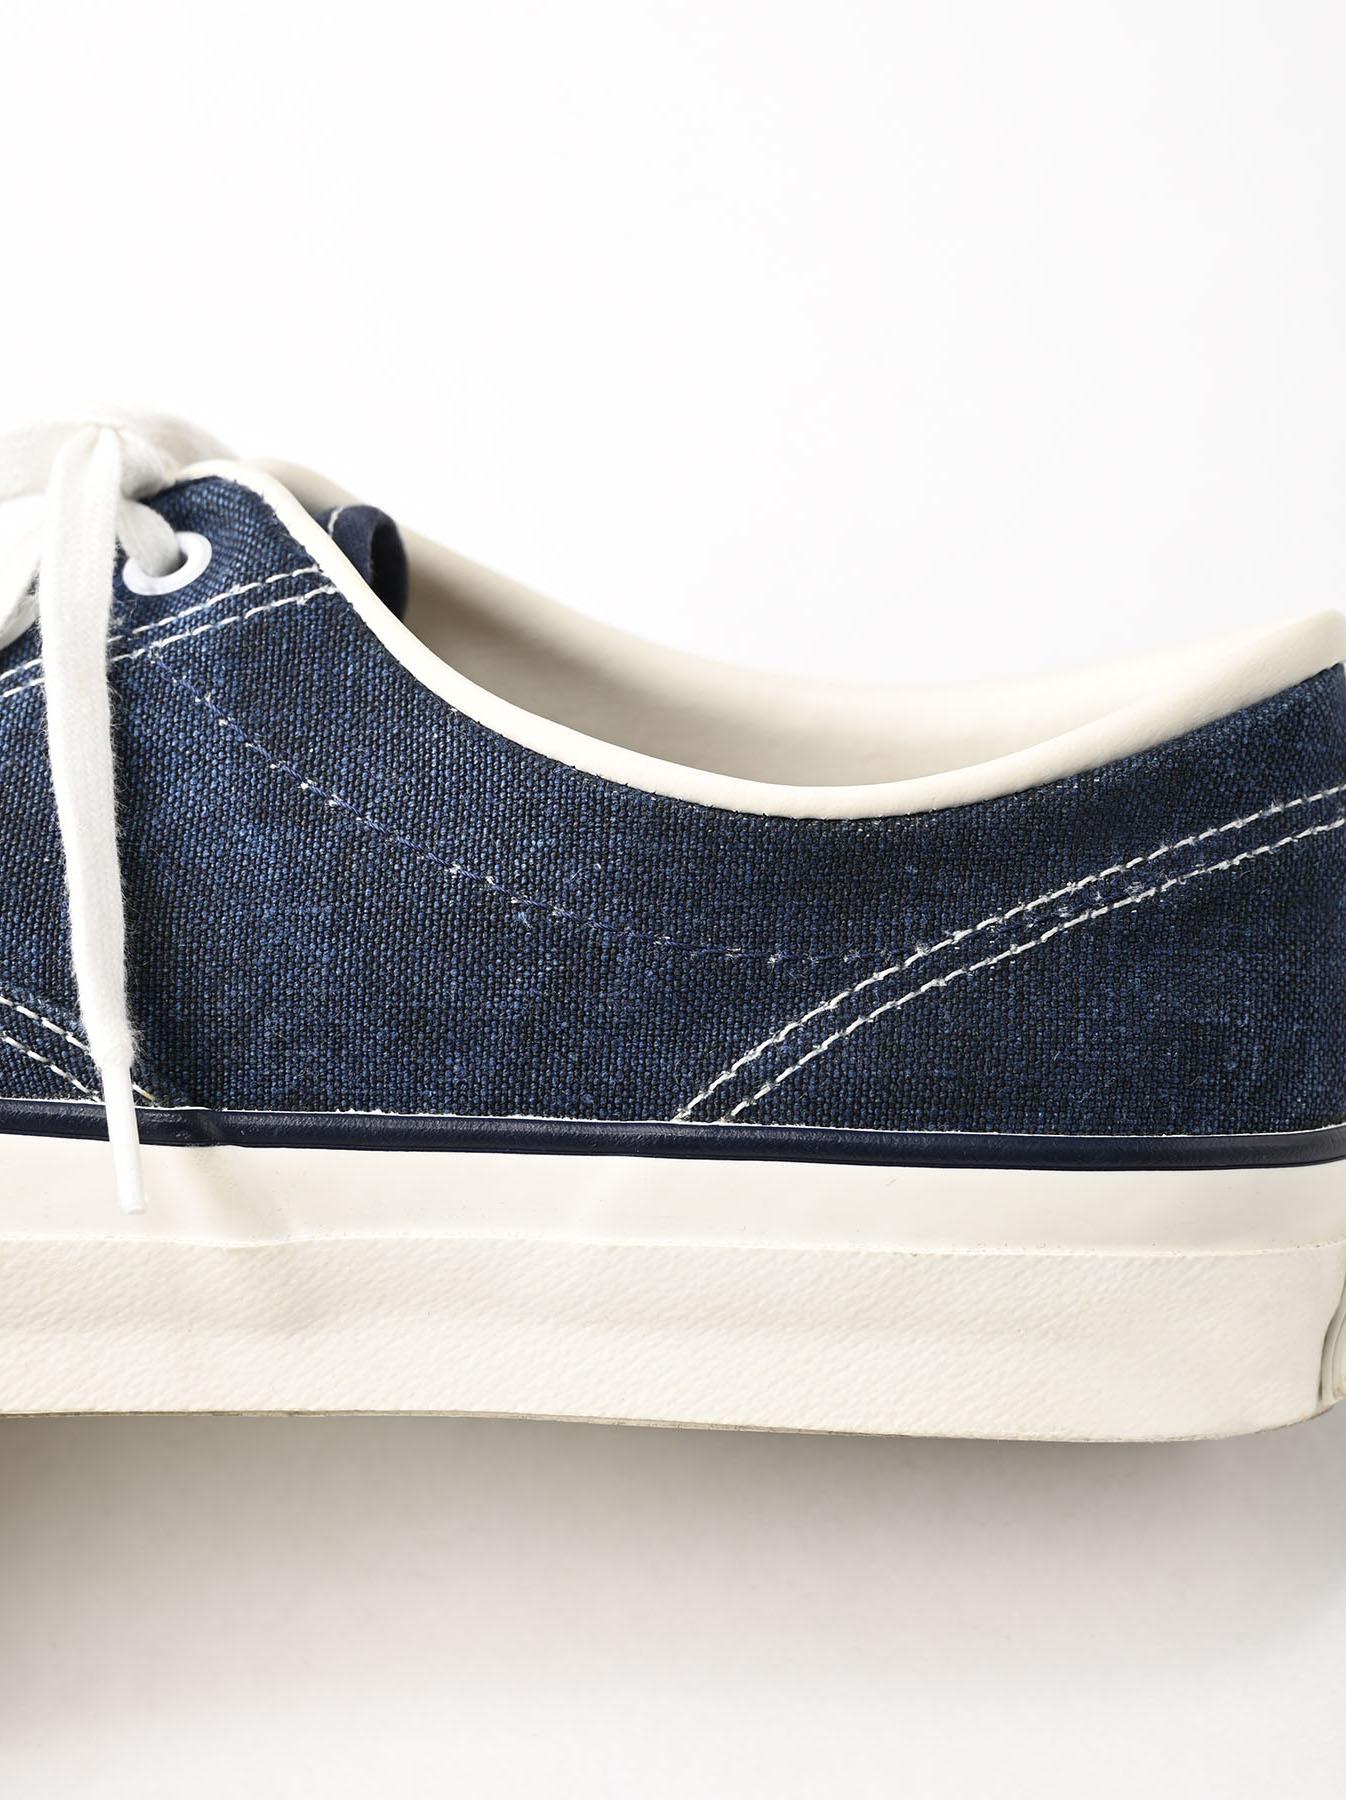 Indigo Linen Duck Sneaker size 5.5-7.5 UK-7